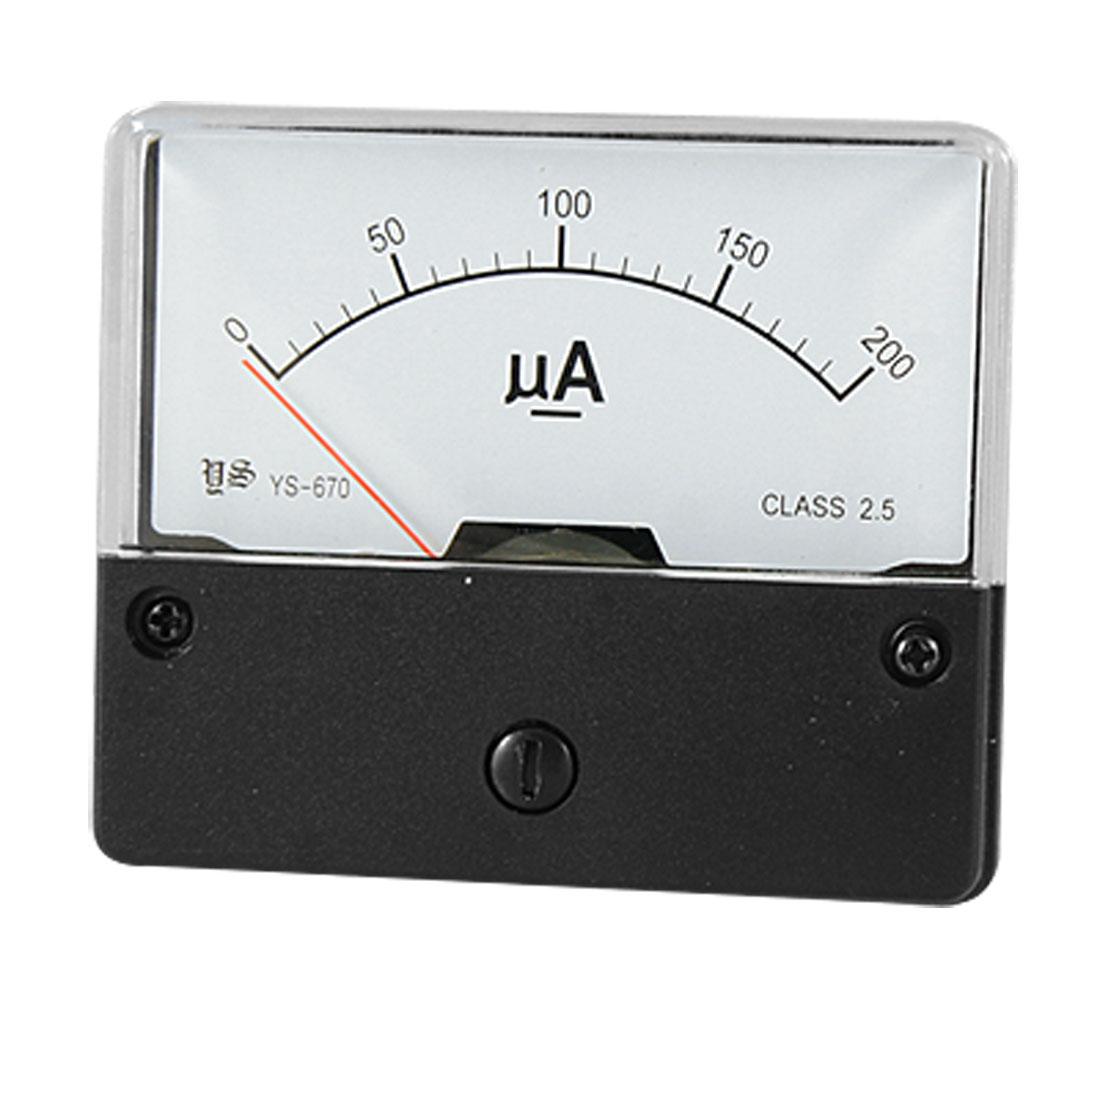 Analogue DC 0-200uA Current Panel Meter Measuring Tool